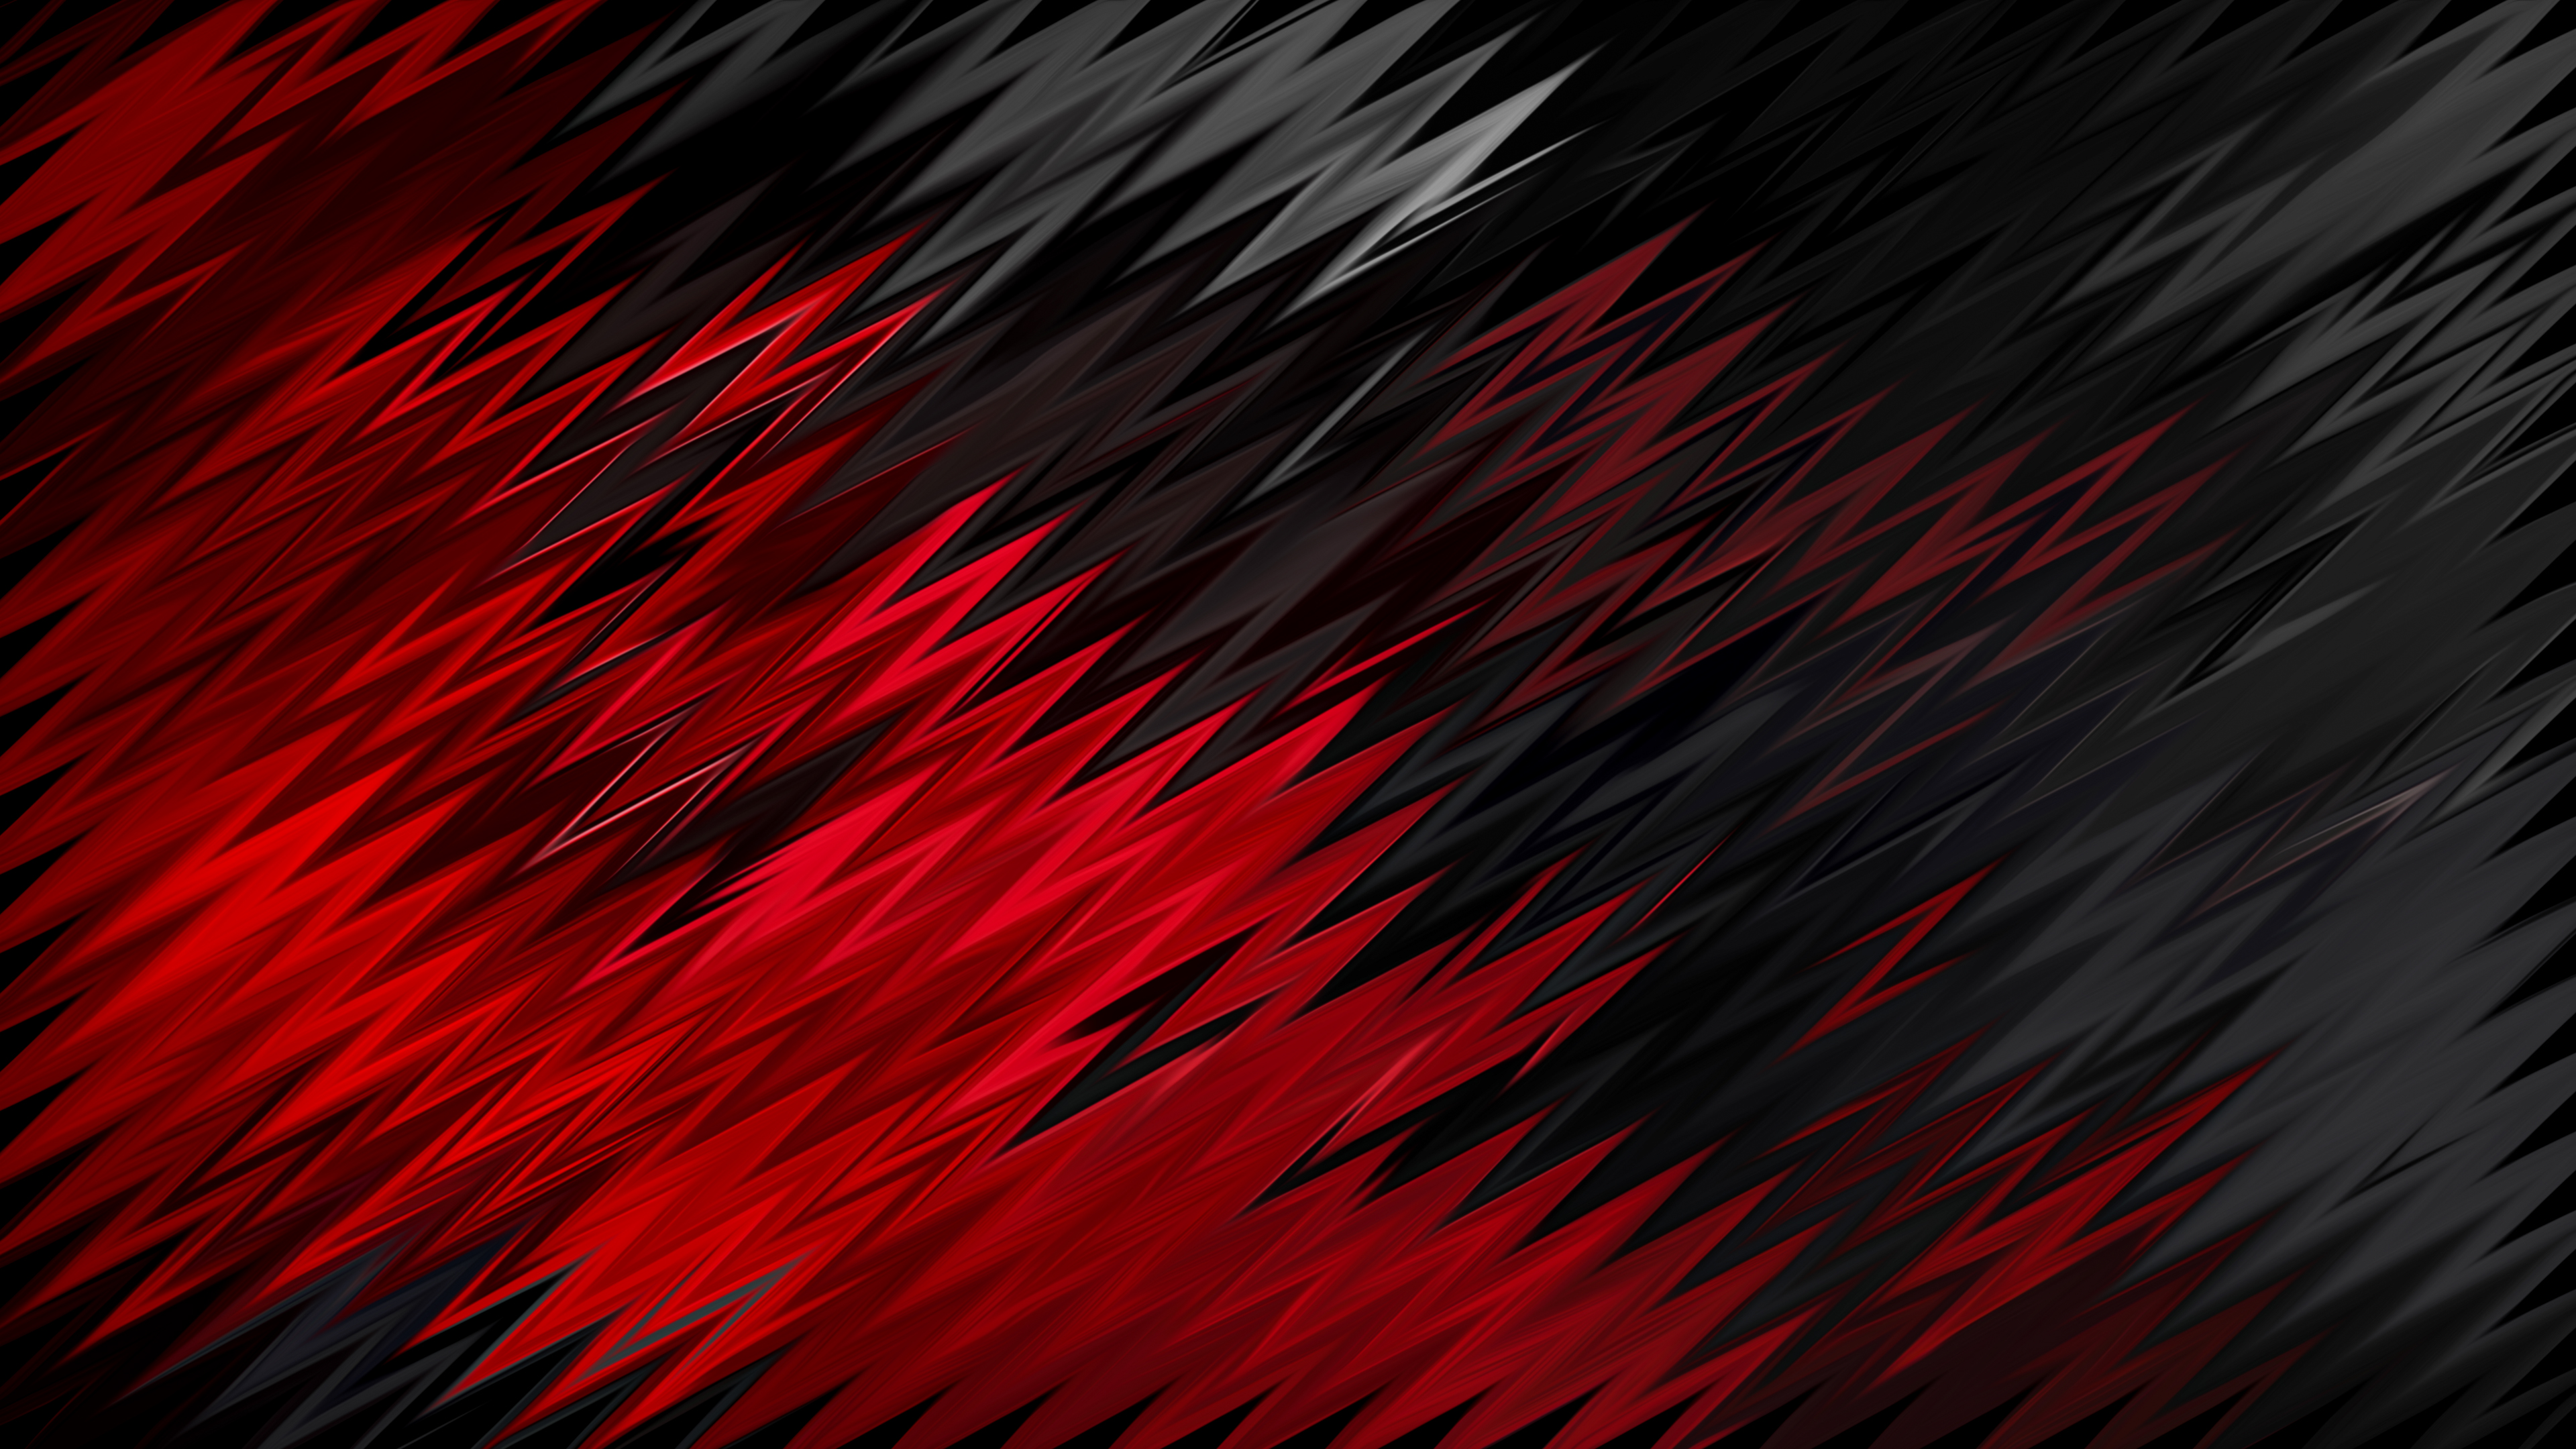 red black sharp shapes 4k 1602439648 - Red Black Sharp Shapes 4k - Red Black Sharp Shapes 4k wallpapers